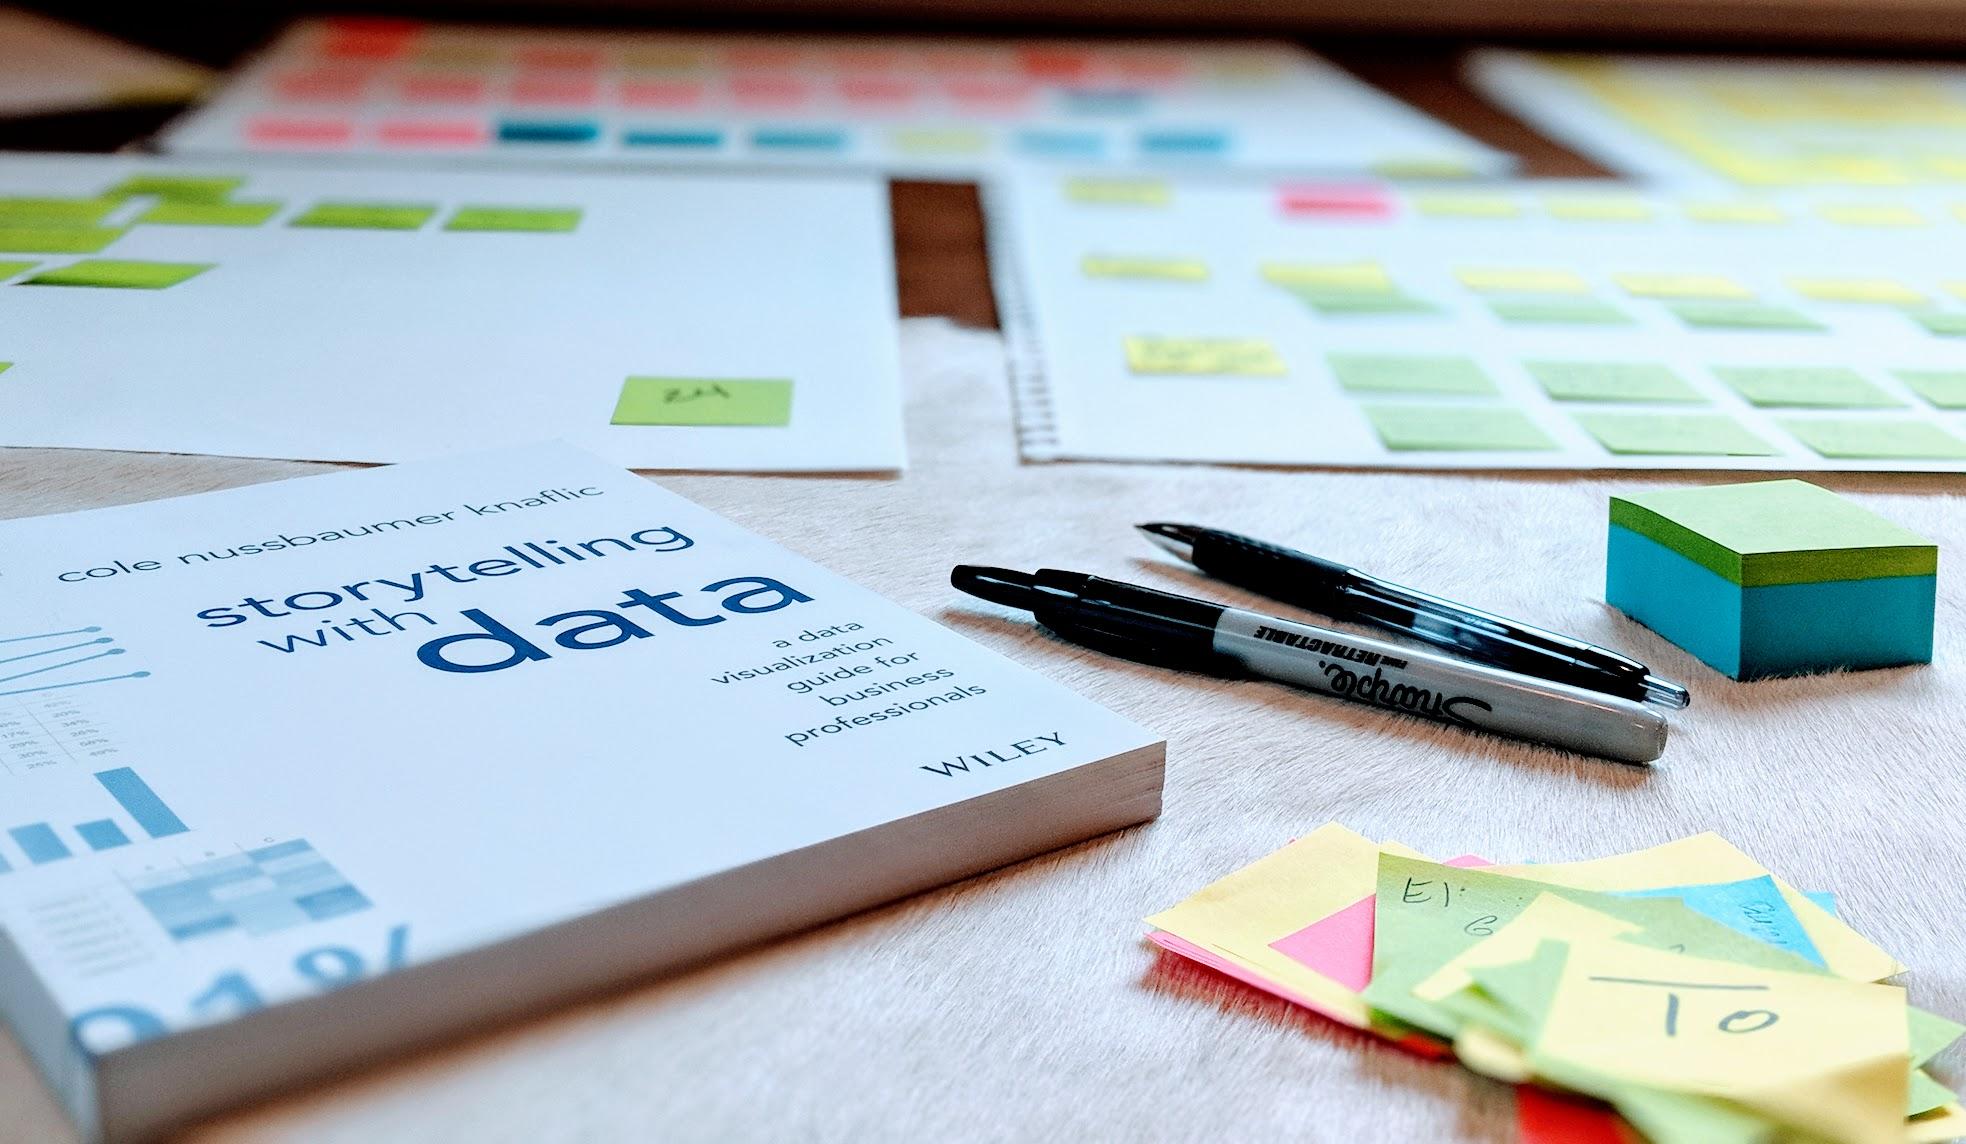 book stickies and my work.jpg